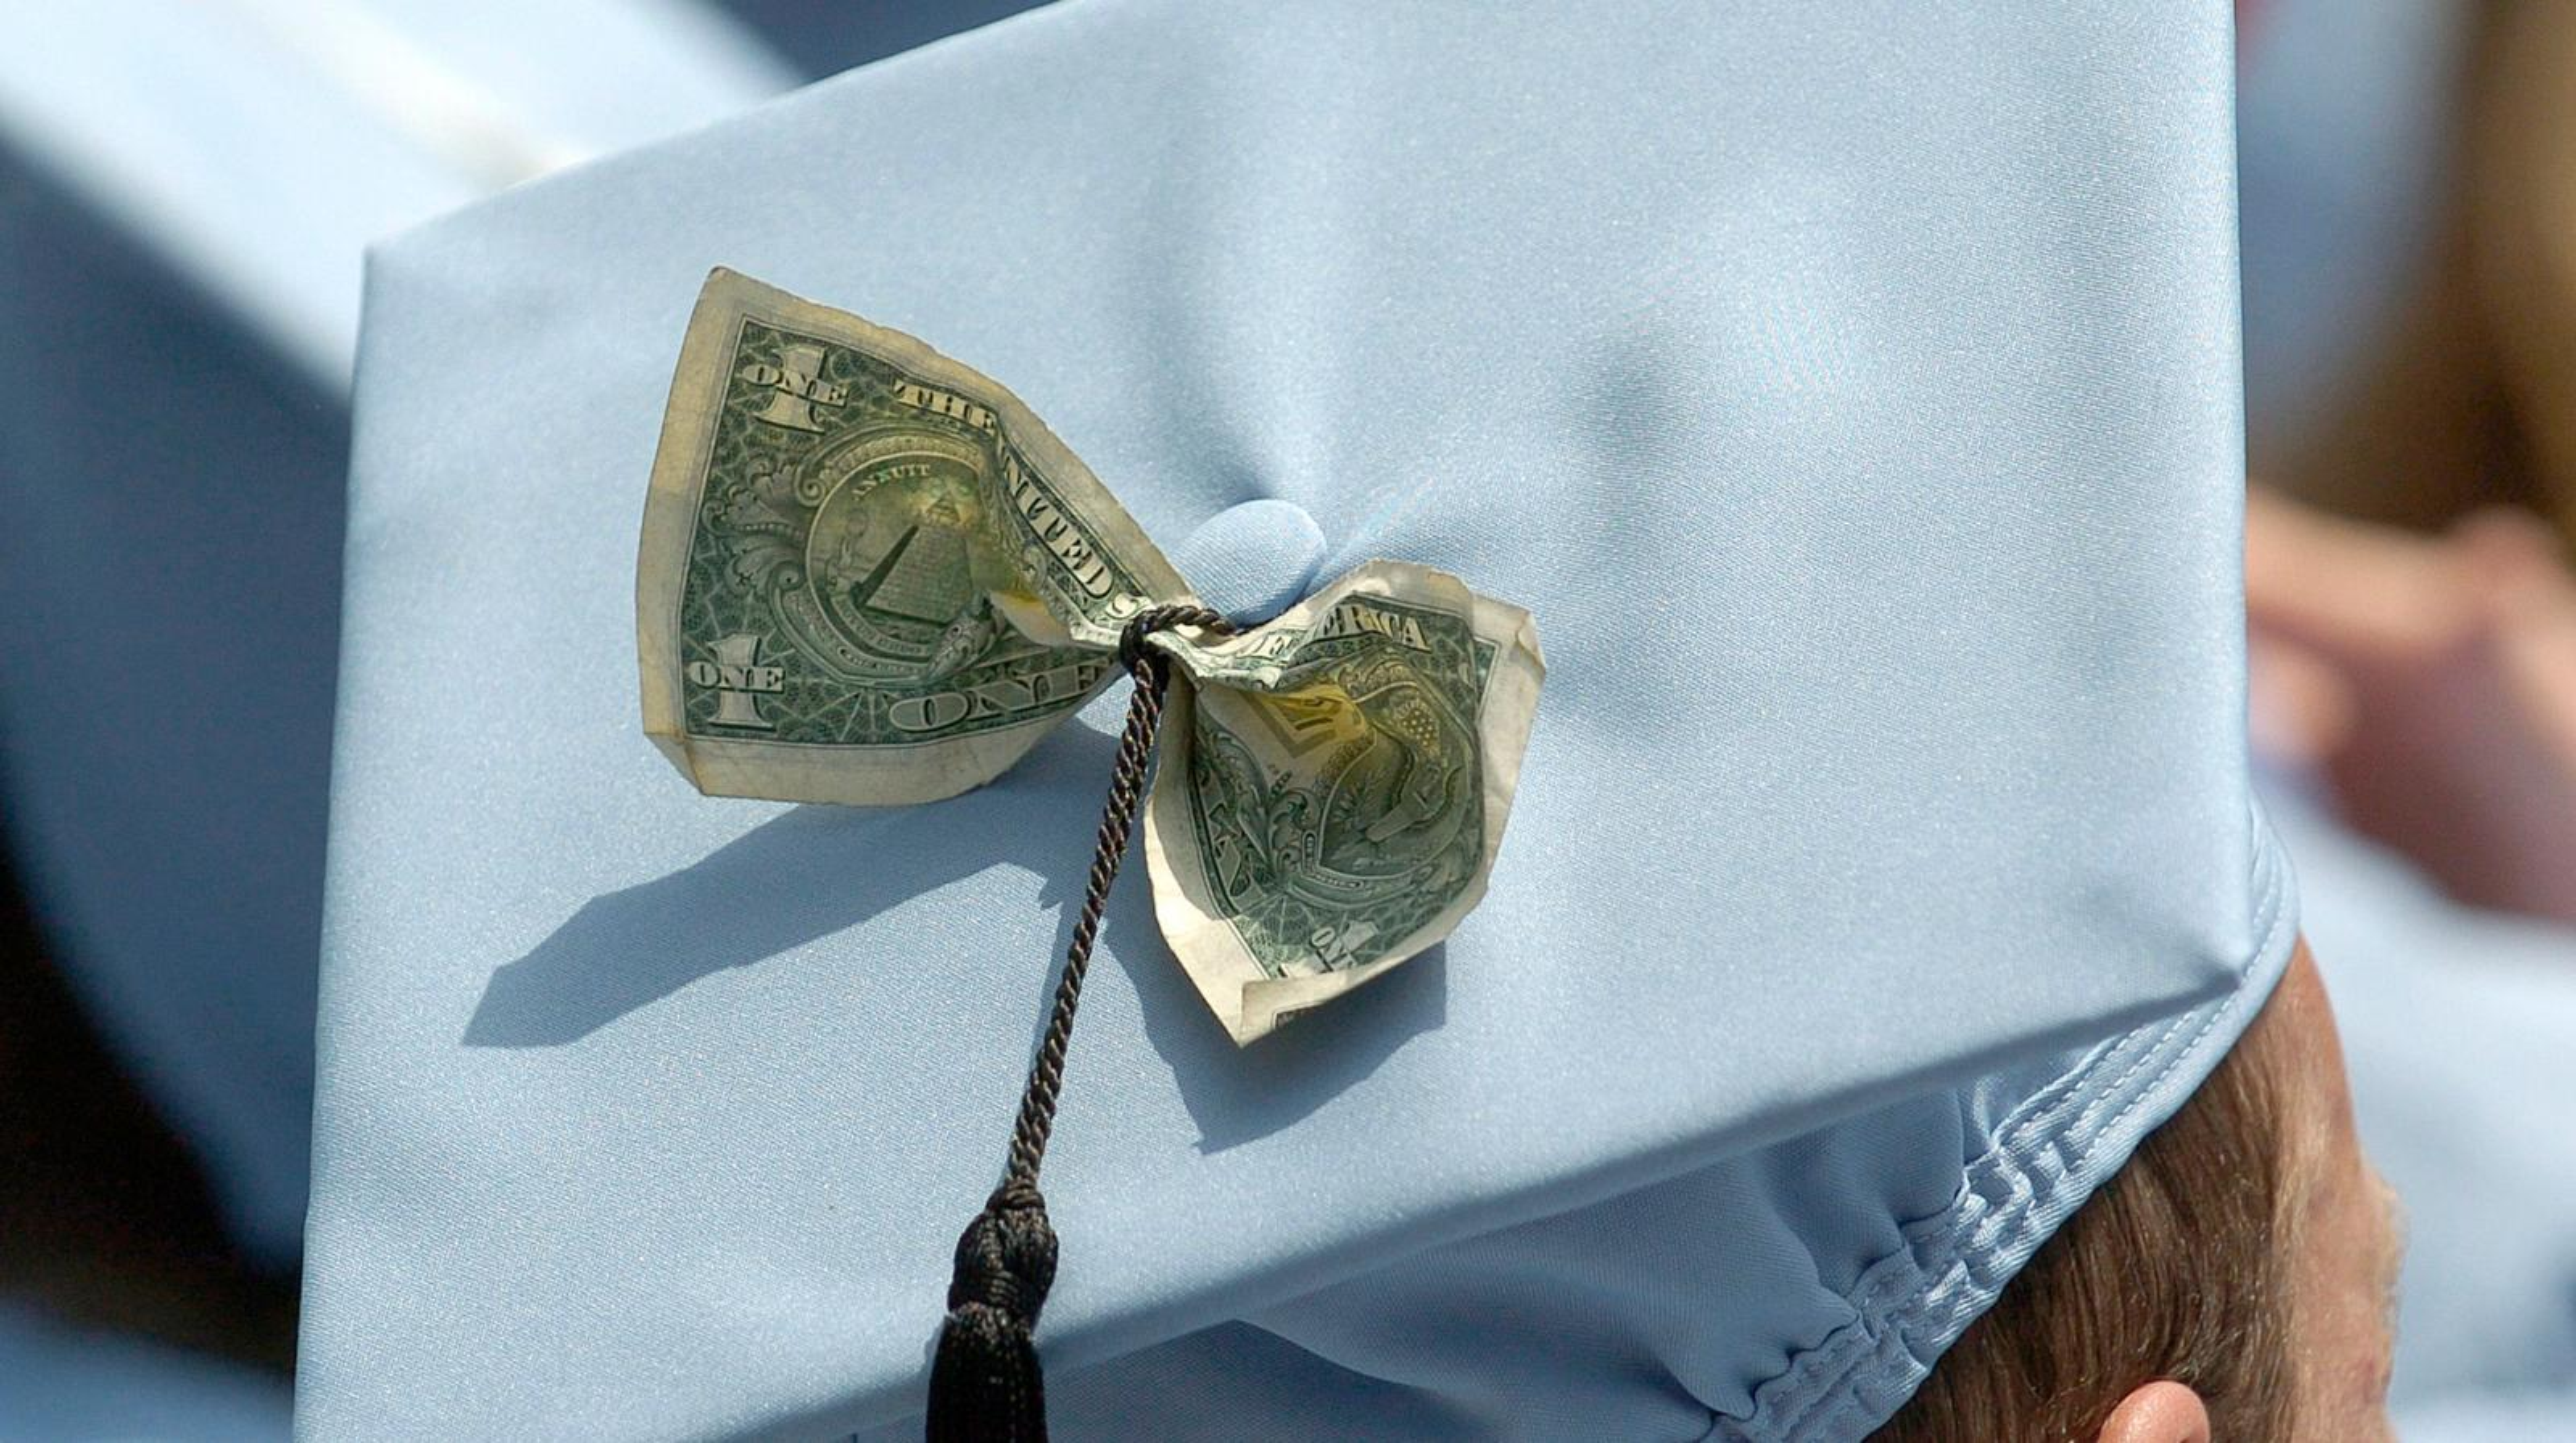 Millennials, please don't waste your money on graduate